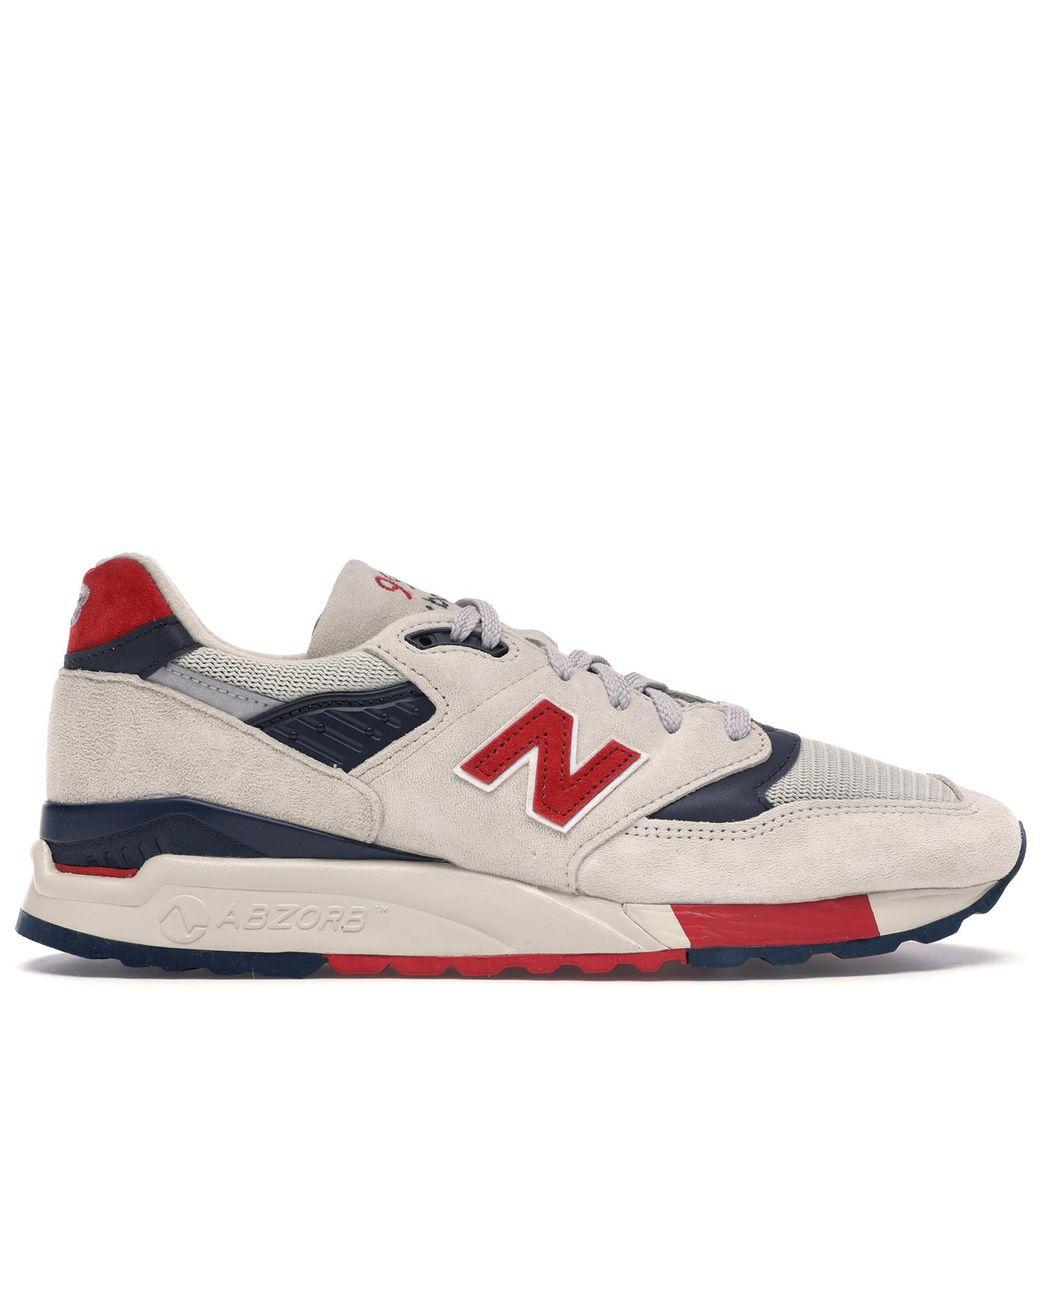 new balance 998 red white blue